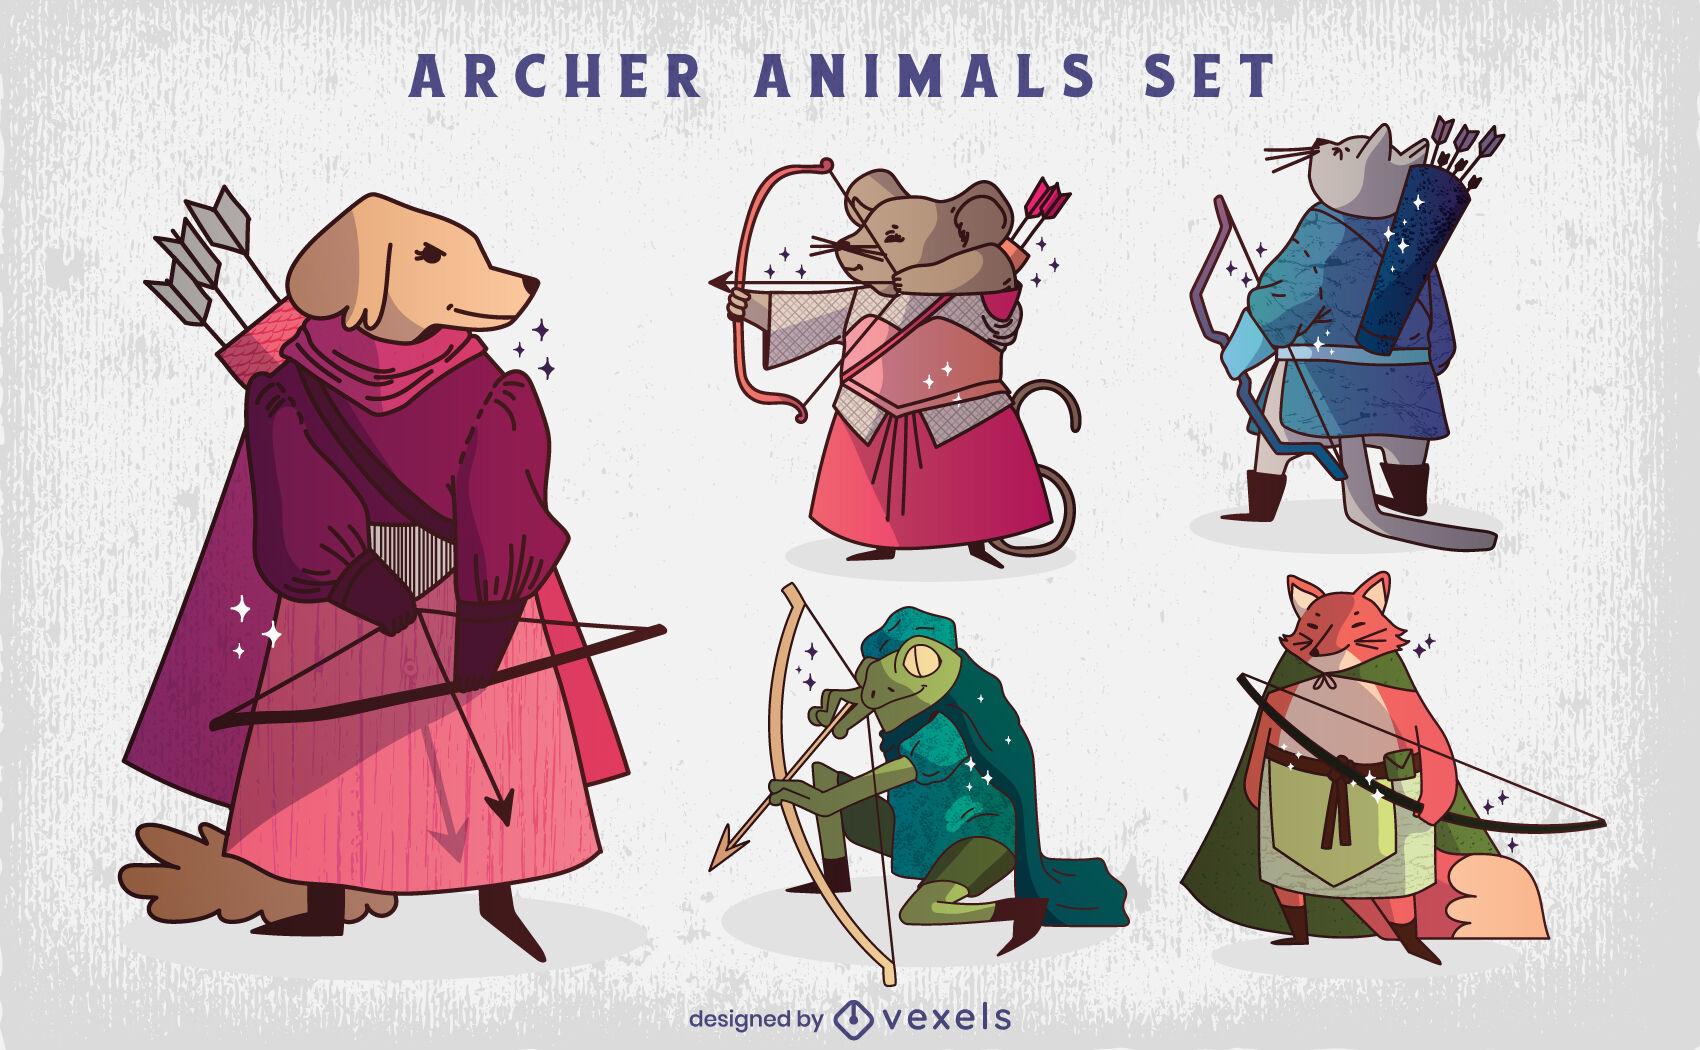 Set of archery animal characters illustration